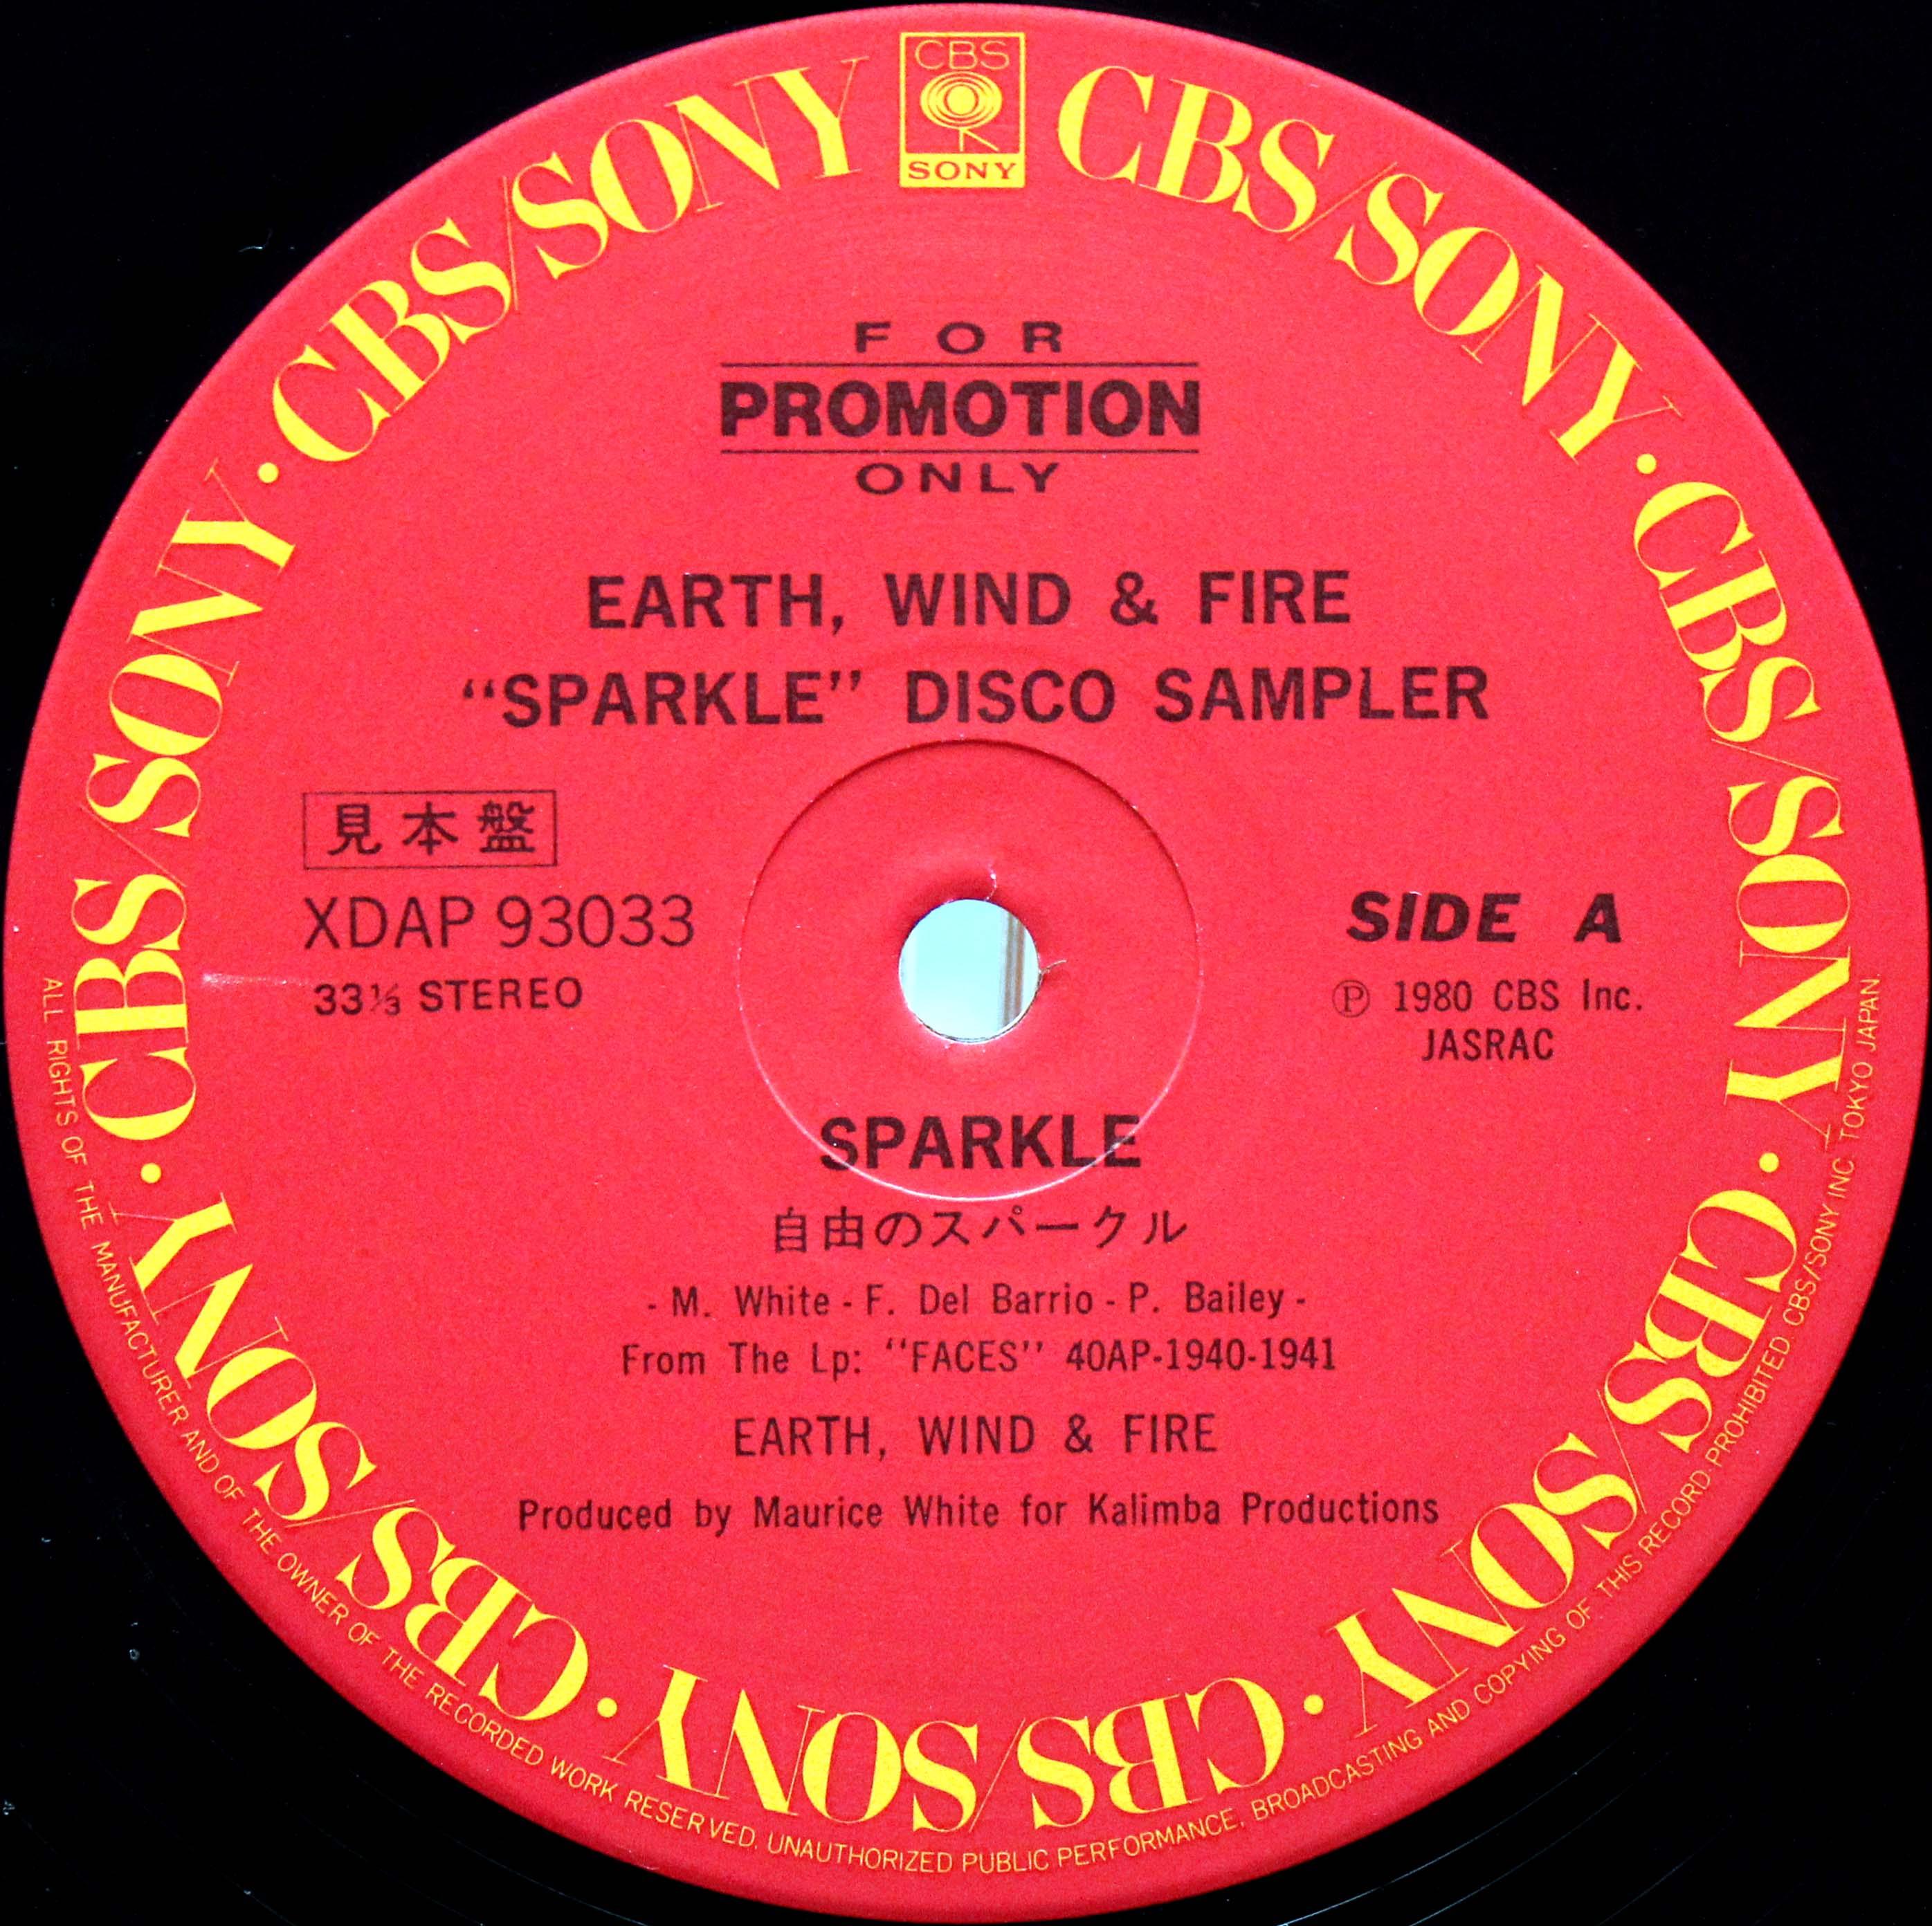 Earth Wind Fire Sparkle Japan 03